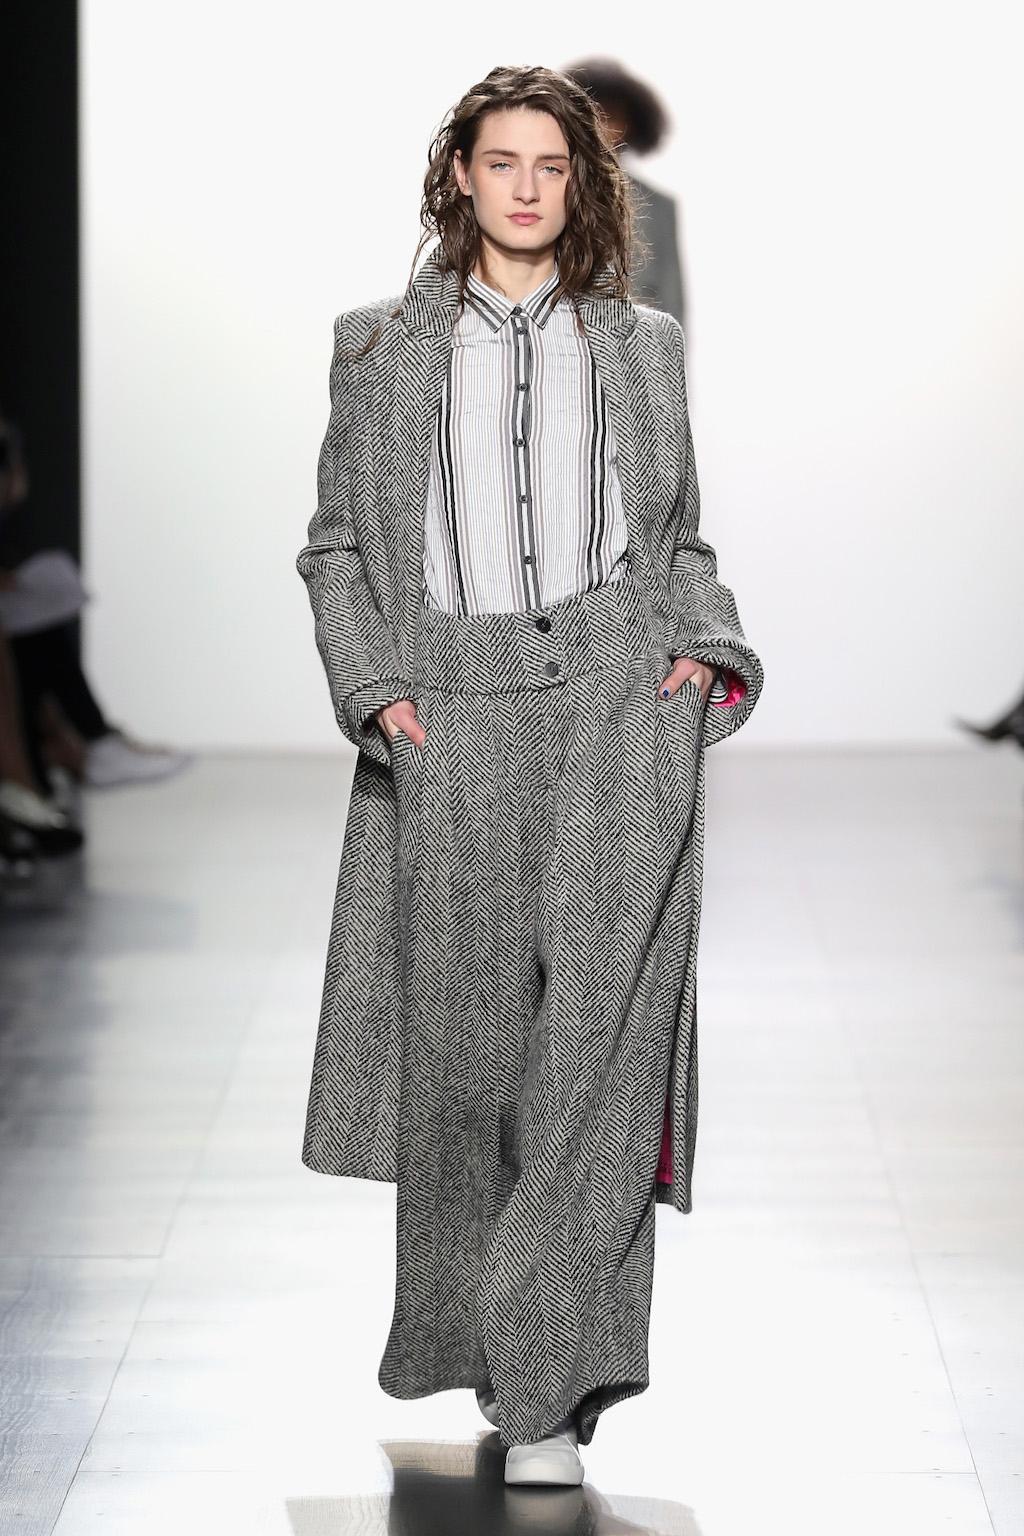 Taoray Wang - Runway - February 2017 - New York Fashion Week: The Shows